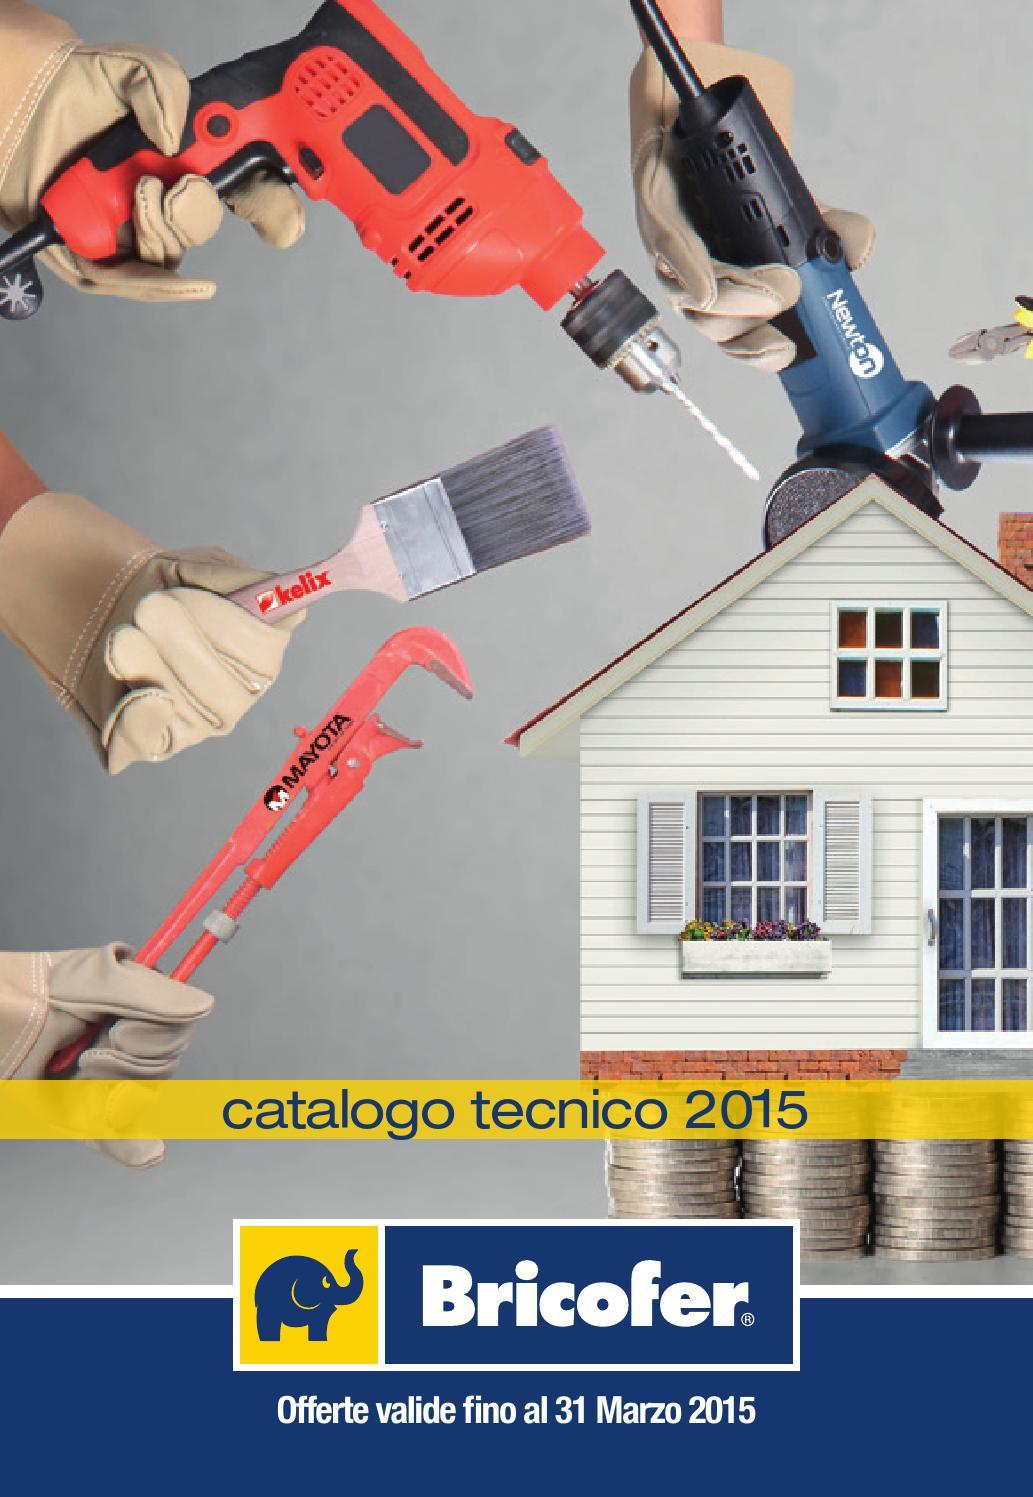 Catalogo tecnico by bricofer italia spa issuu for Catalogo bricofer